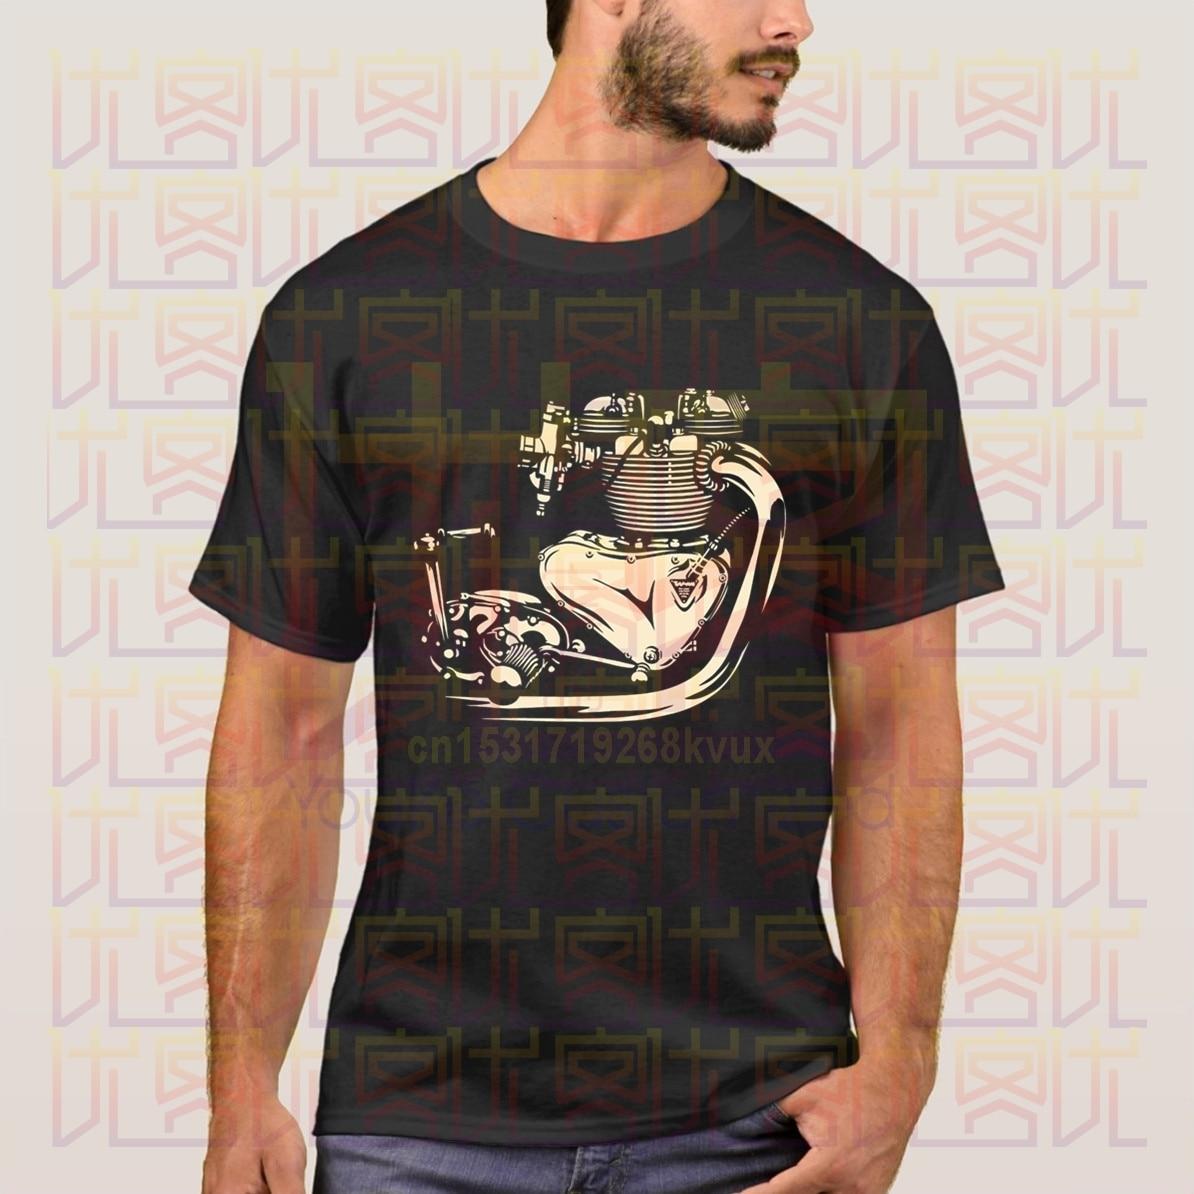 Triumph Engine, camiseta Vintage para motocicleta, verano 2020, camiseta de manga corta para hombre